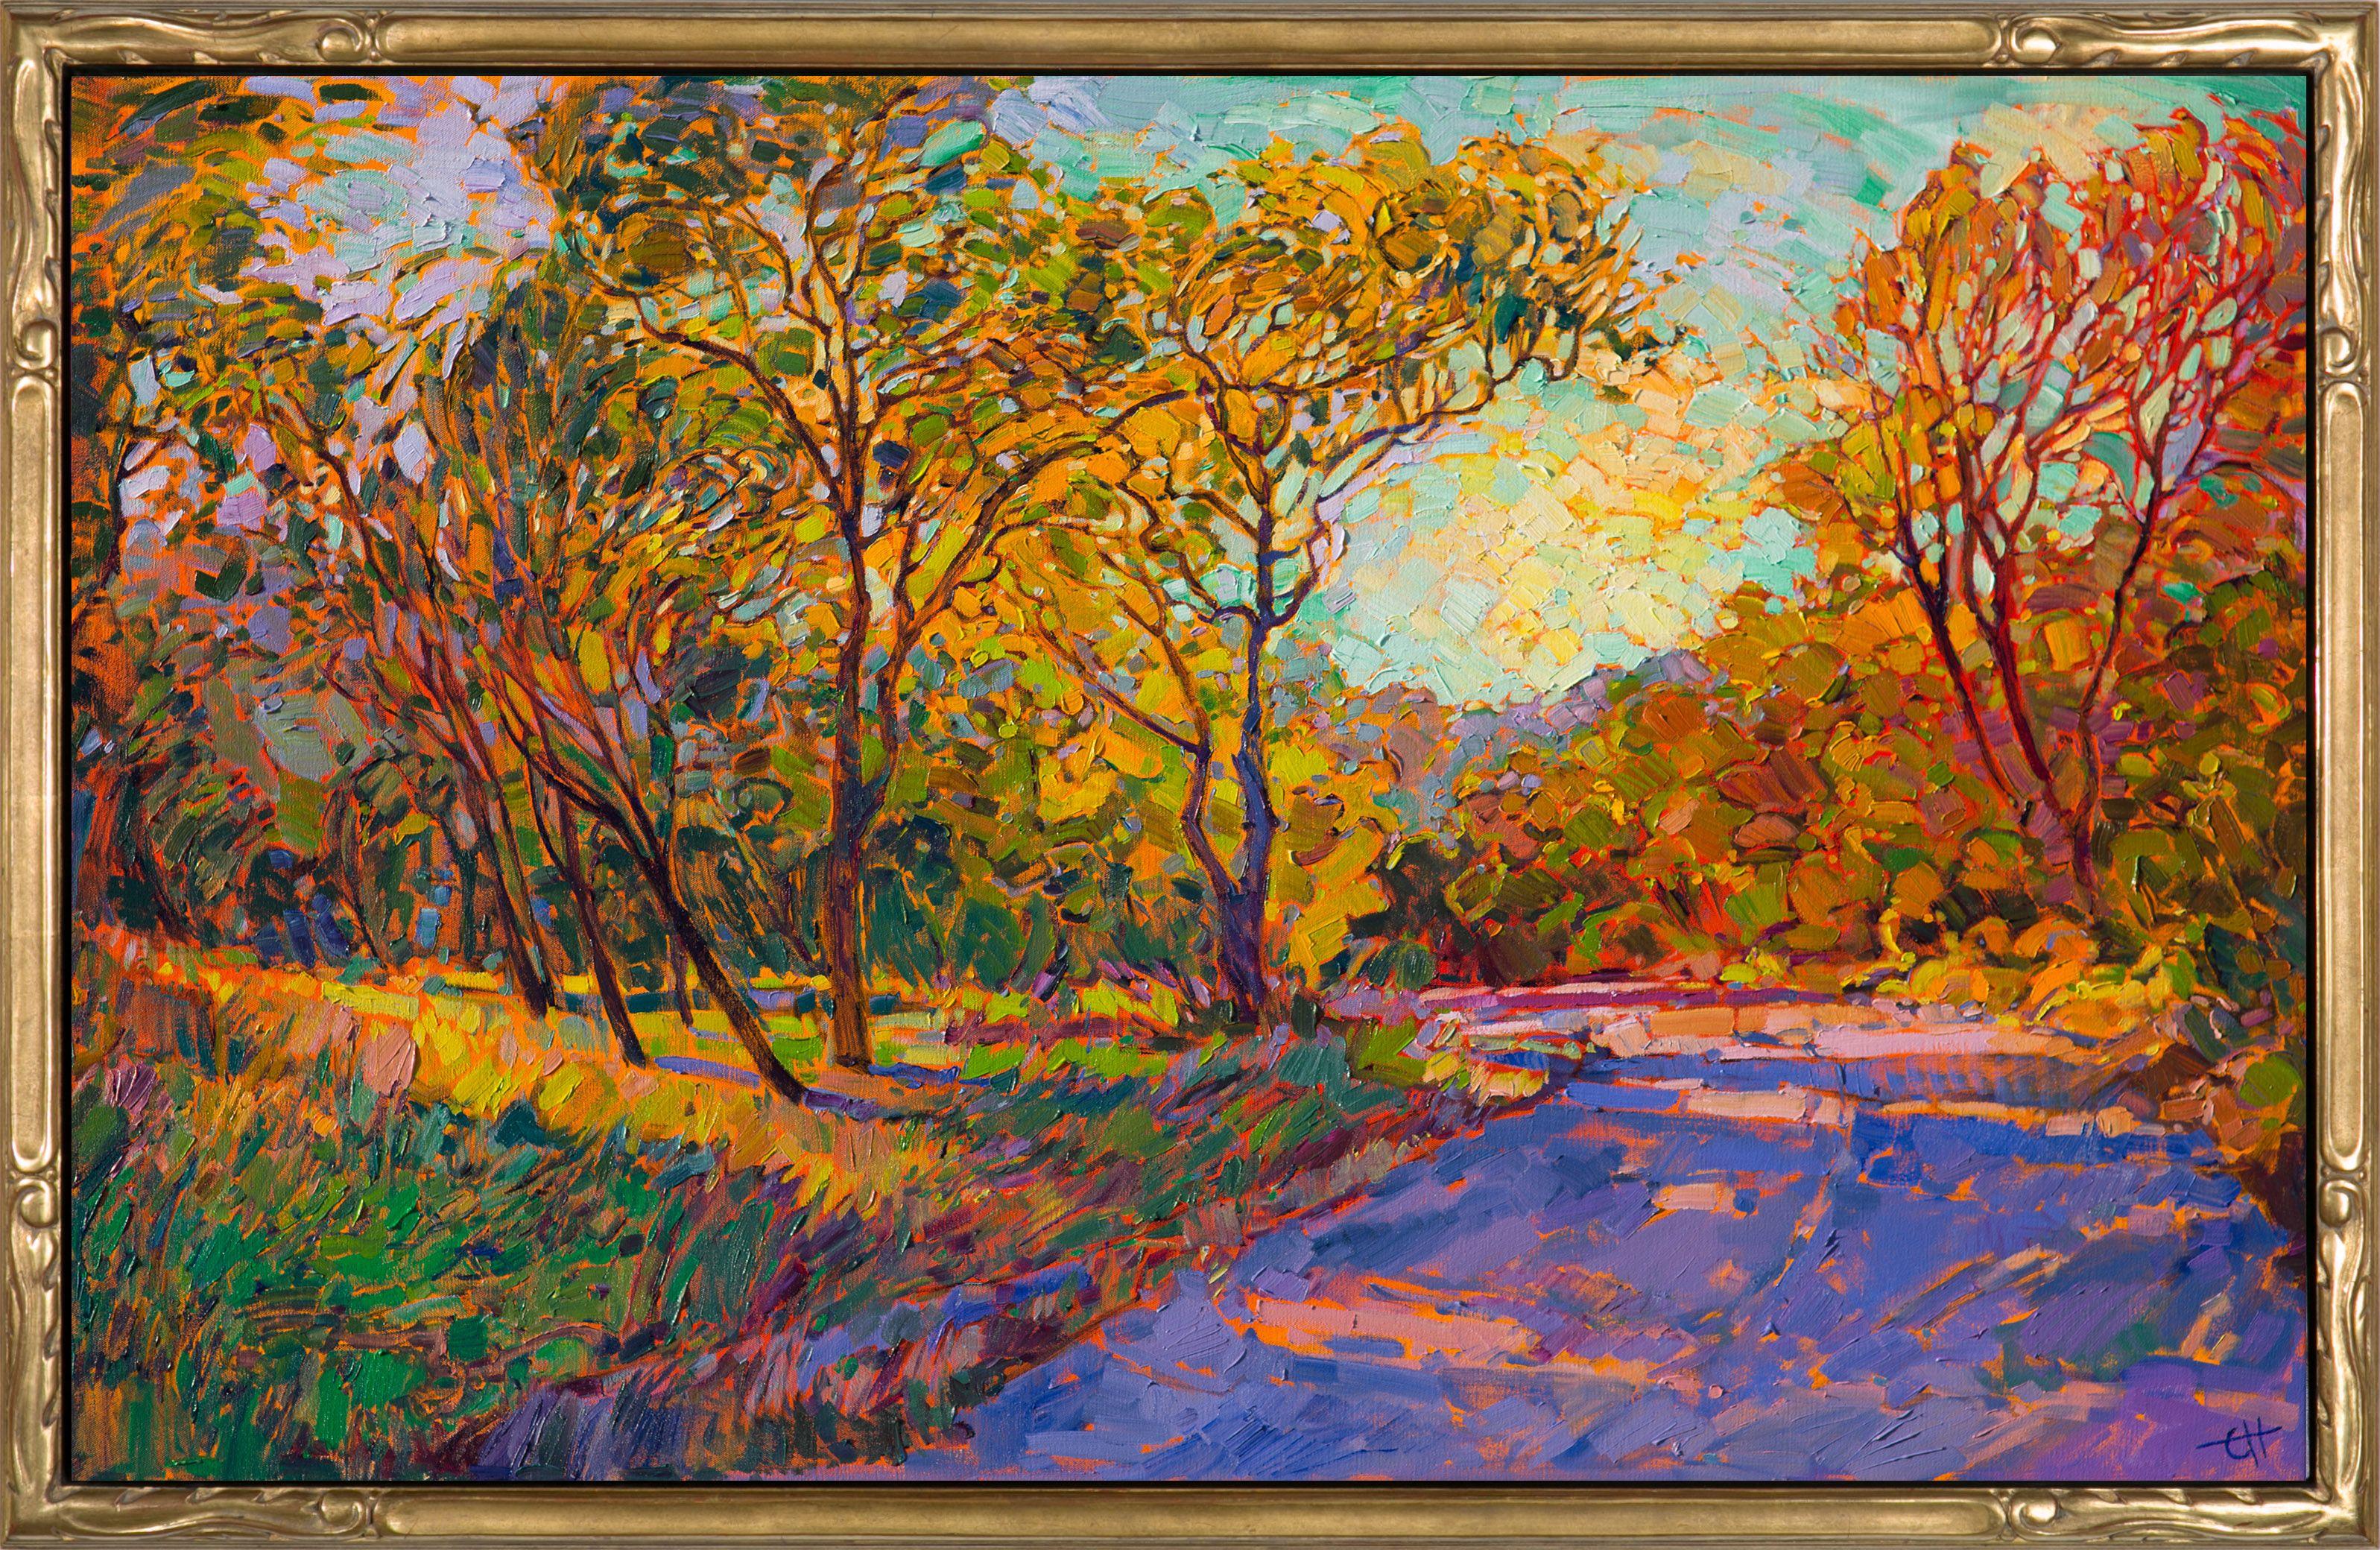 Autumn dawn contemporary impressionism landscape oil